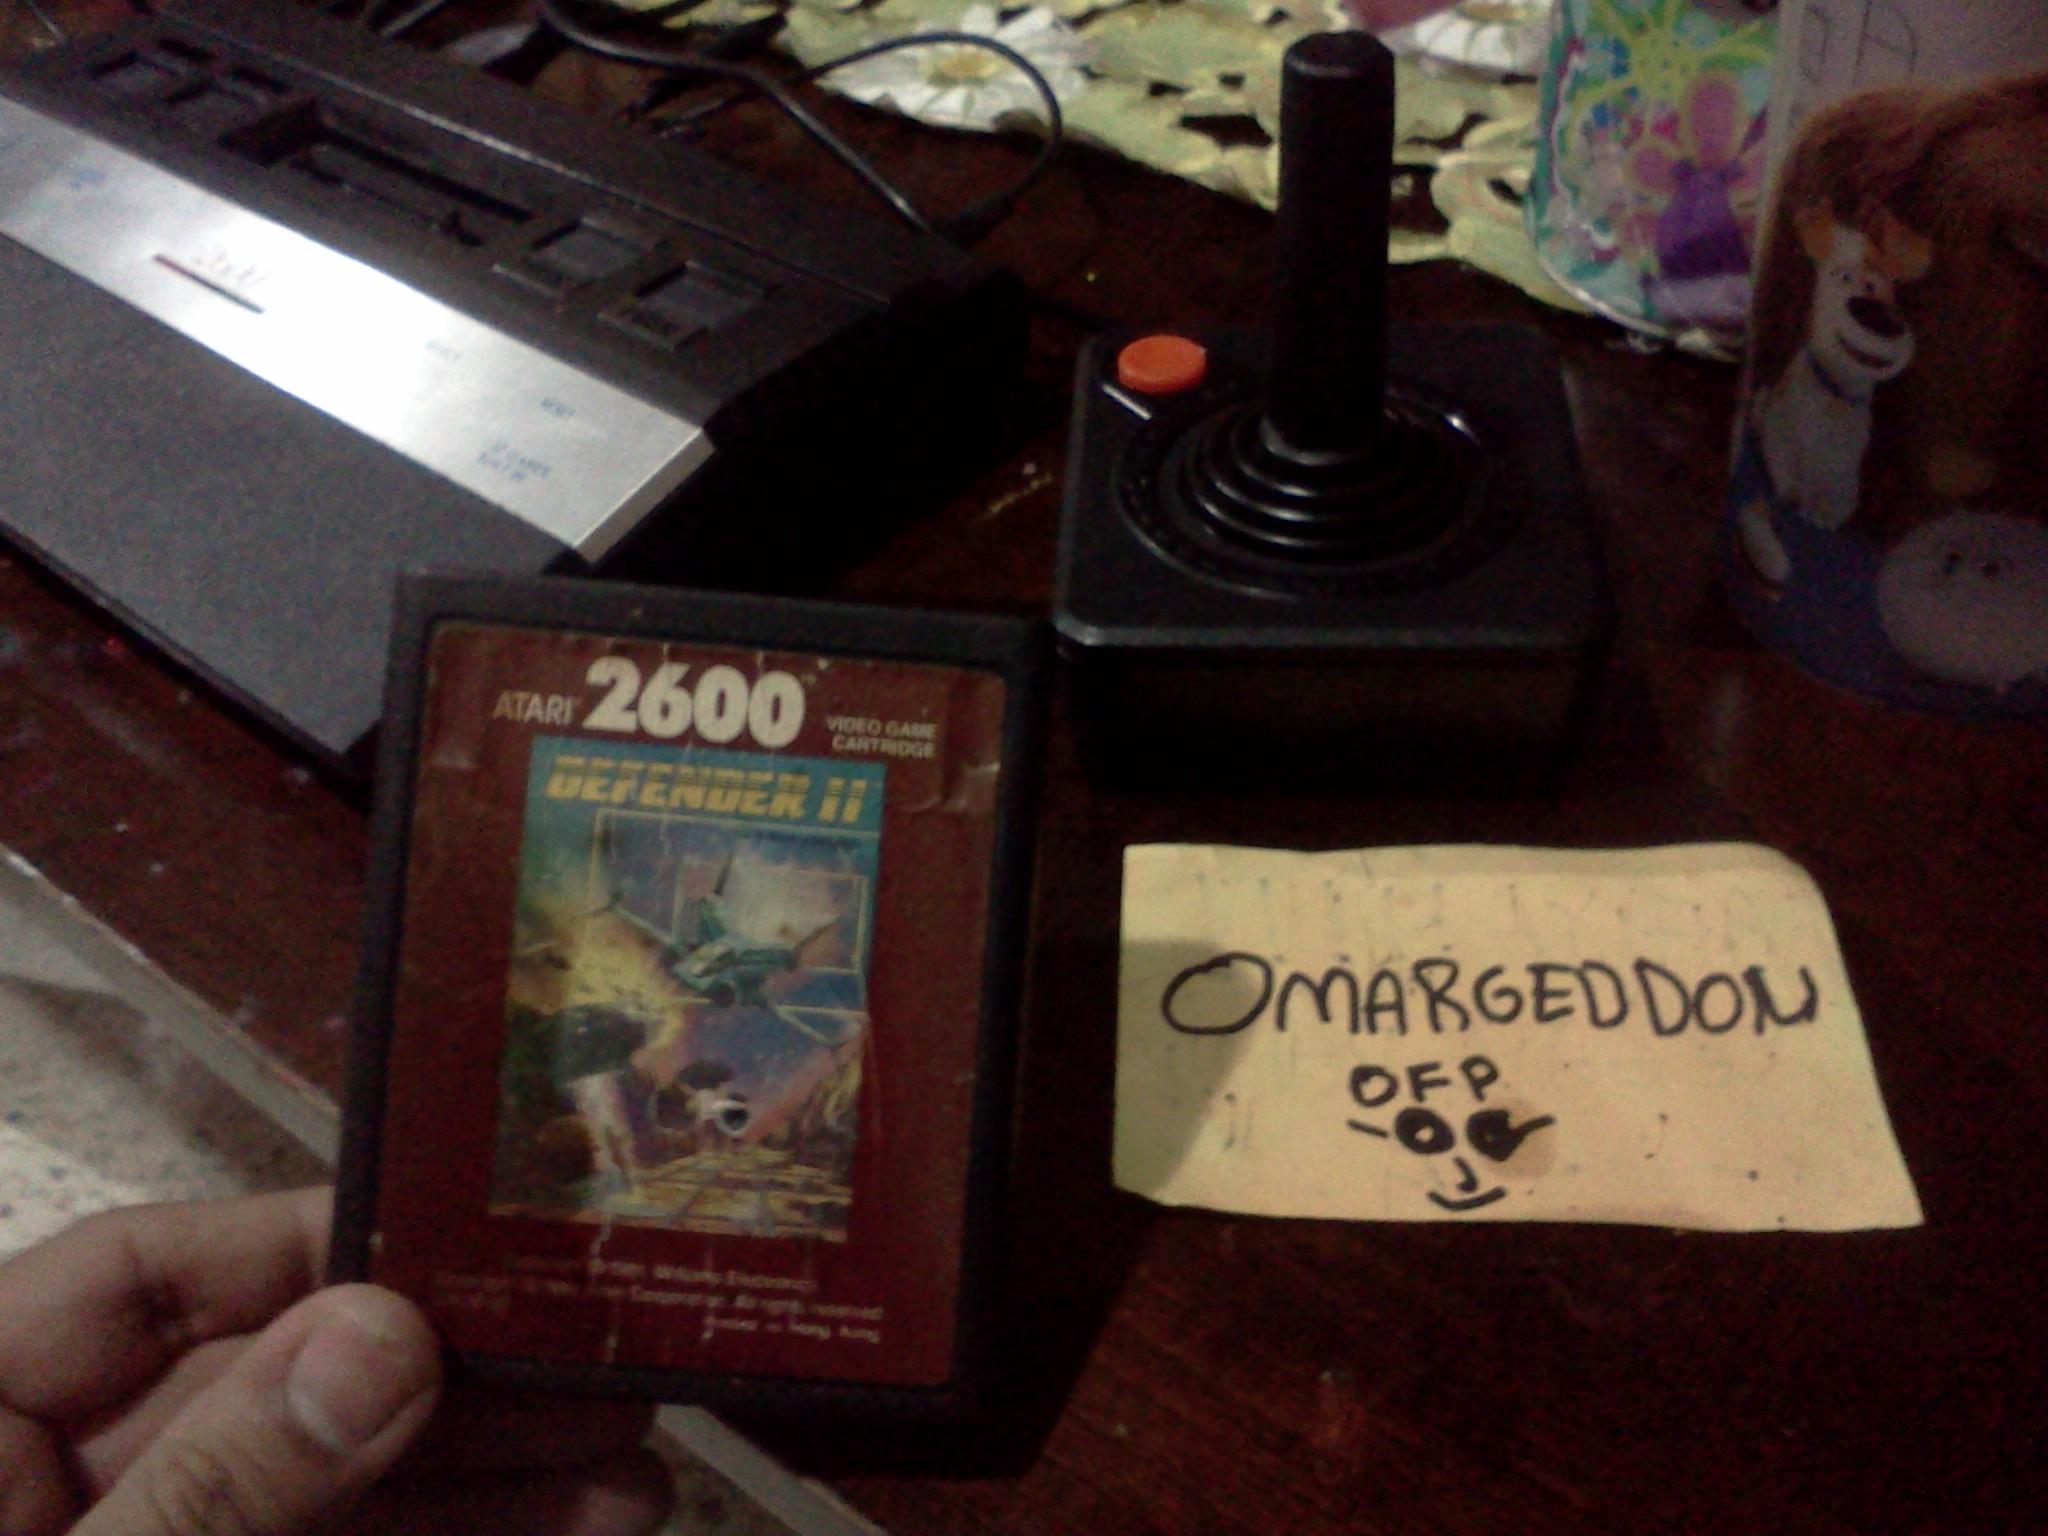 omargeddon: Defender II / Stargate (Atari 2600 Novice/B) 28,450 points on 2016-08-31 20:26:17